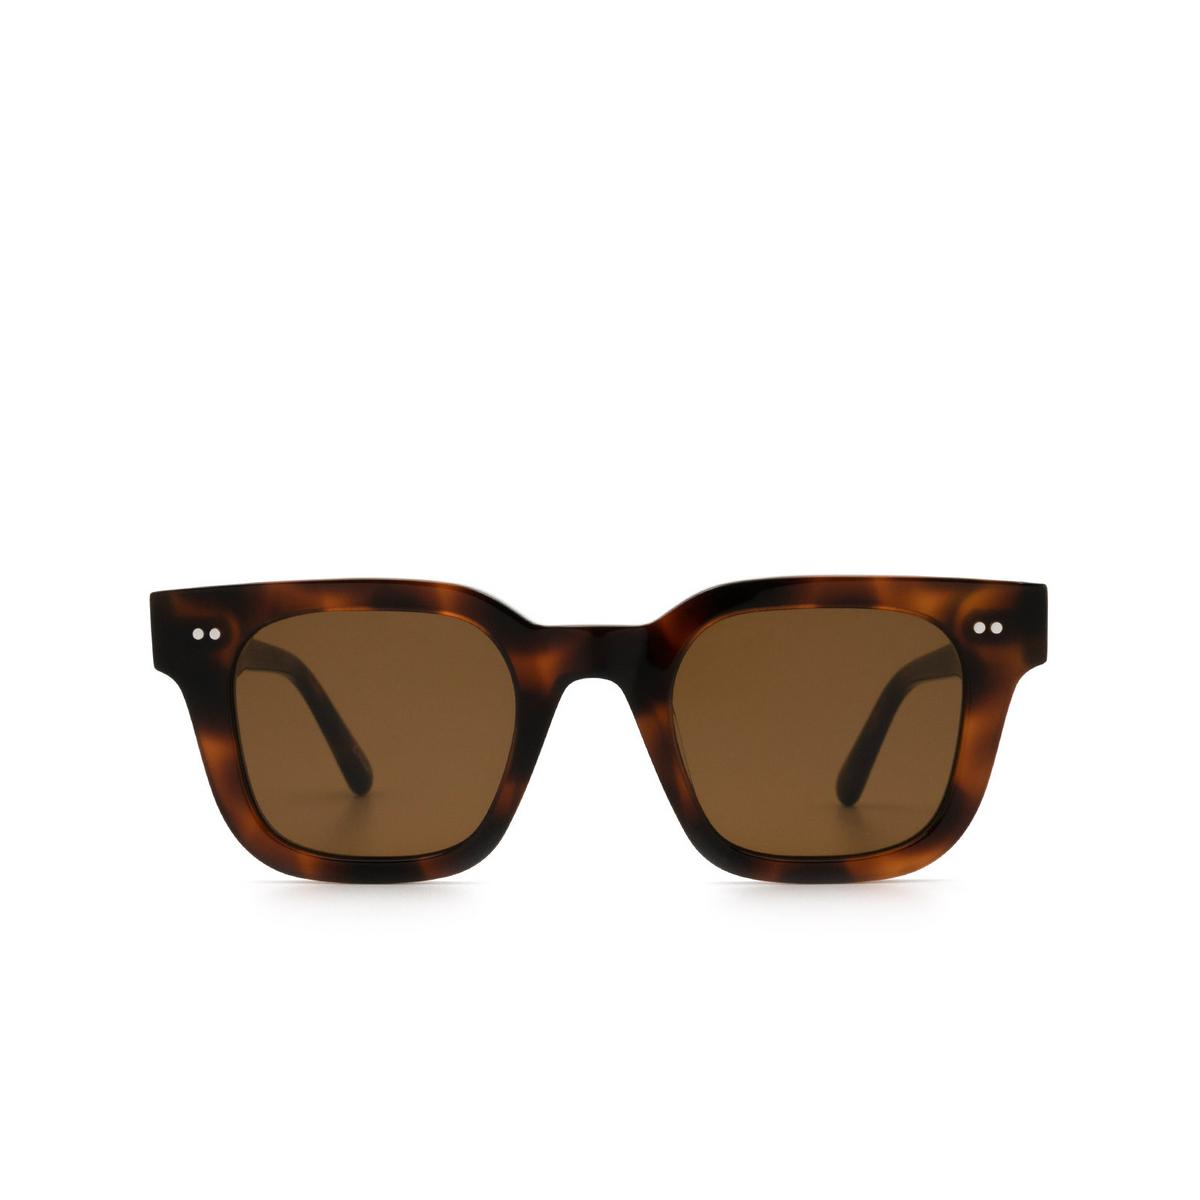 Chimi® Square Sunglasses: 04 color Tortoise - front view.